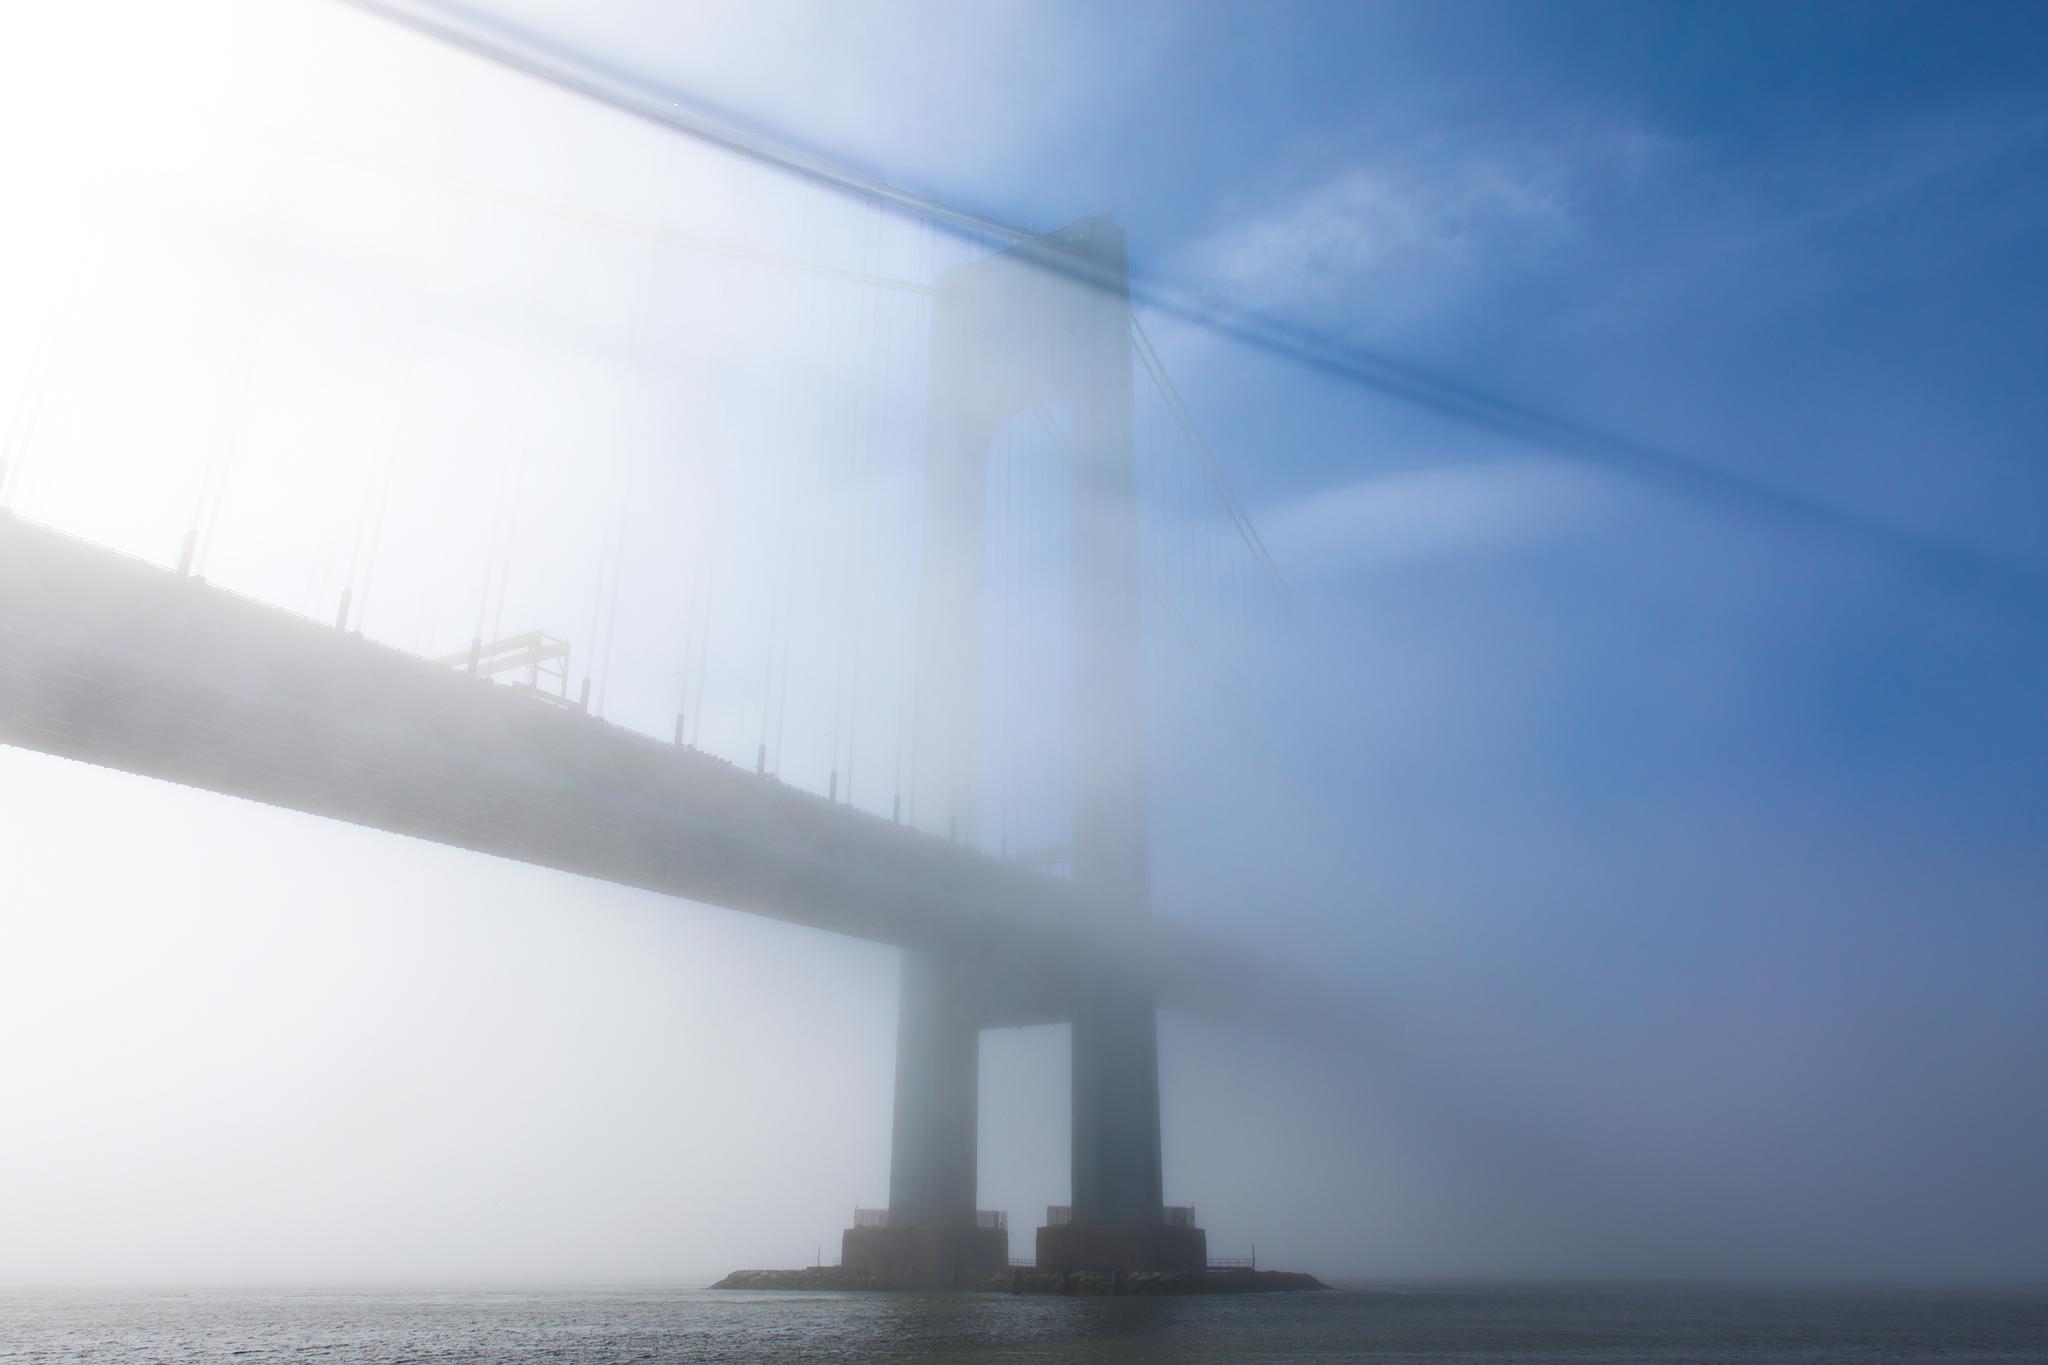 fb.cc.2.25.2017.Verrazano-Narrows Bridge in Fog_K9A1507.jpg